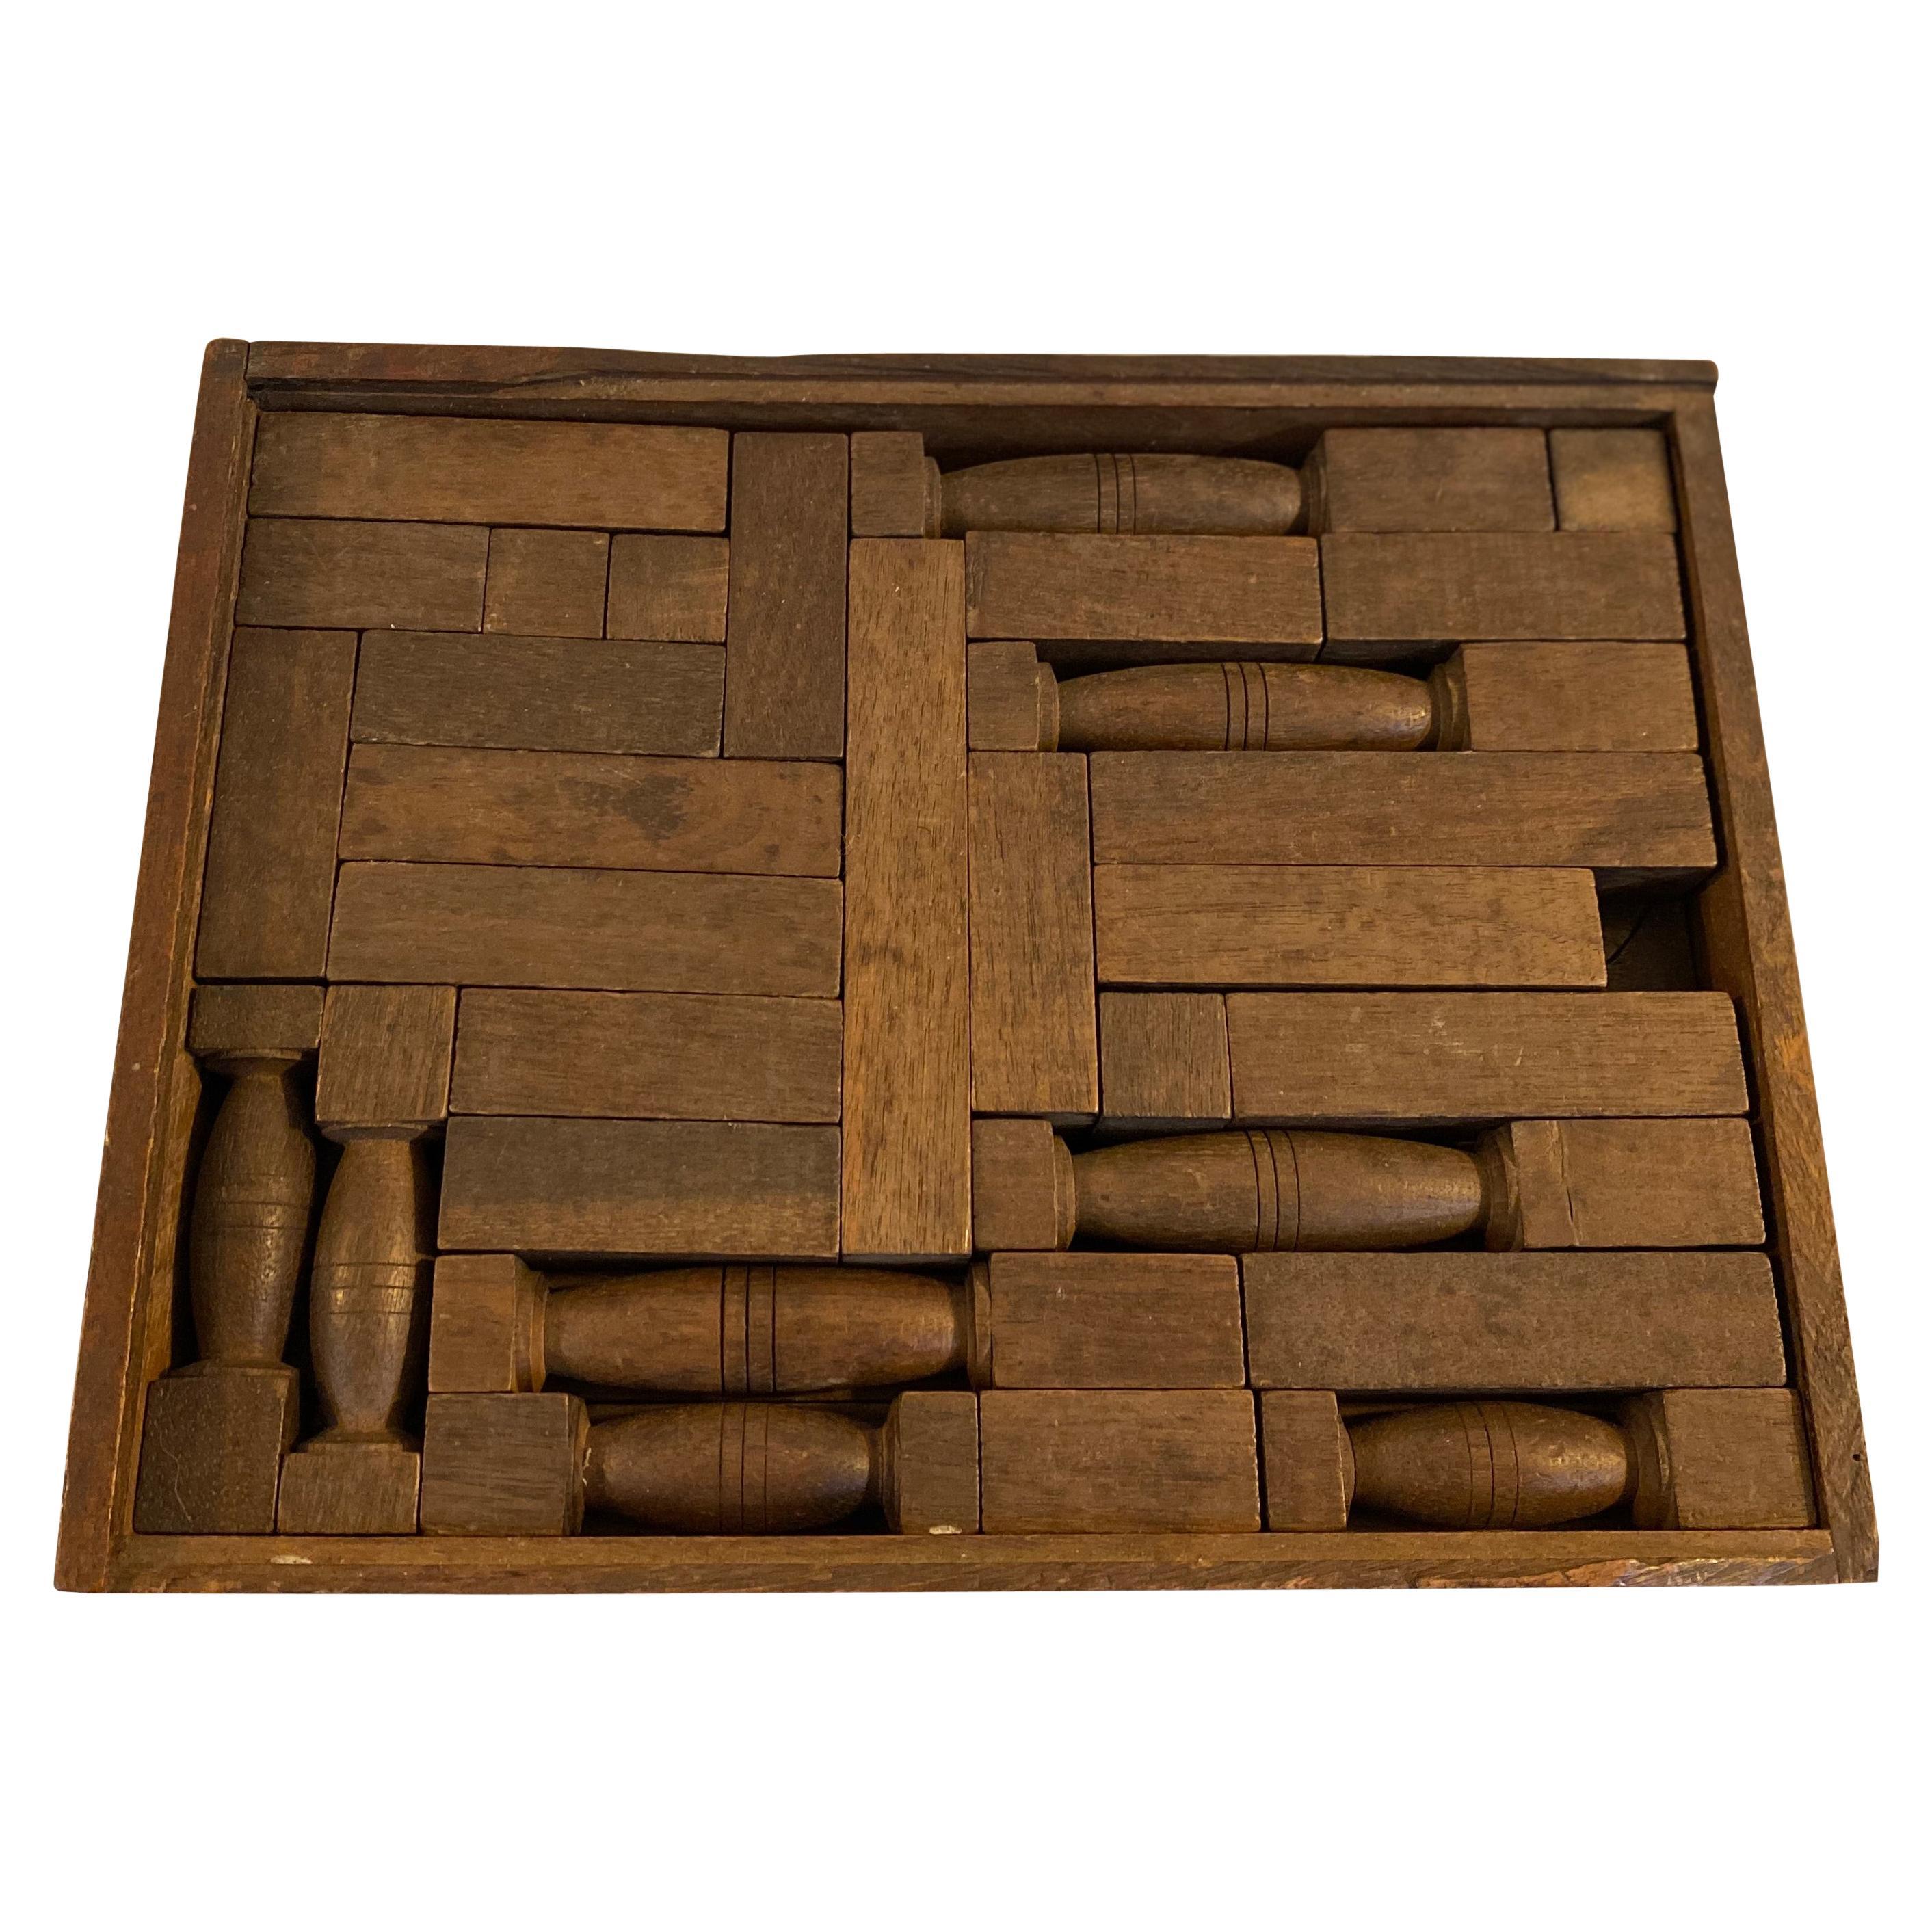 19th Century Antique Wooden Building Blocks / Game Pieces